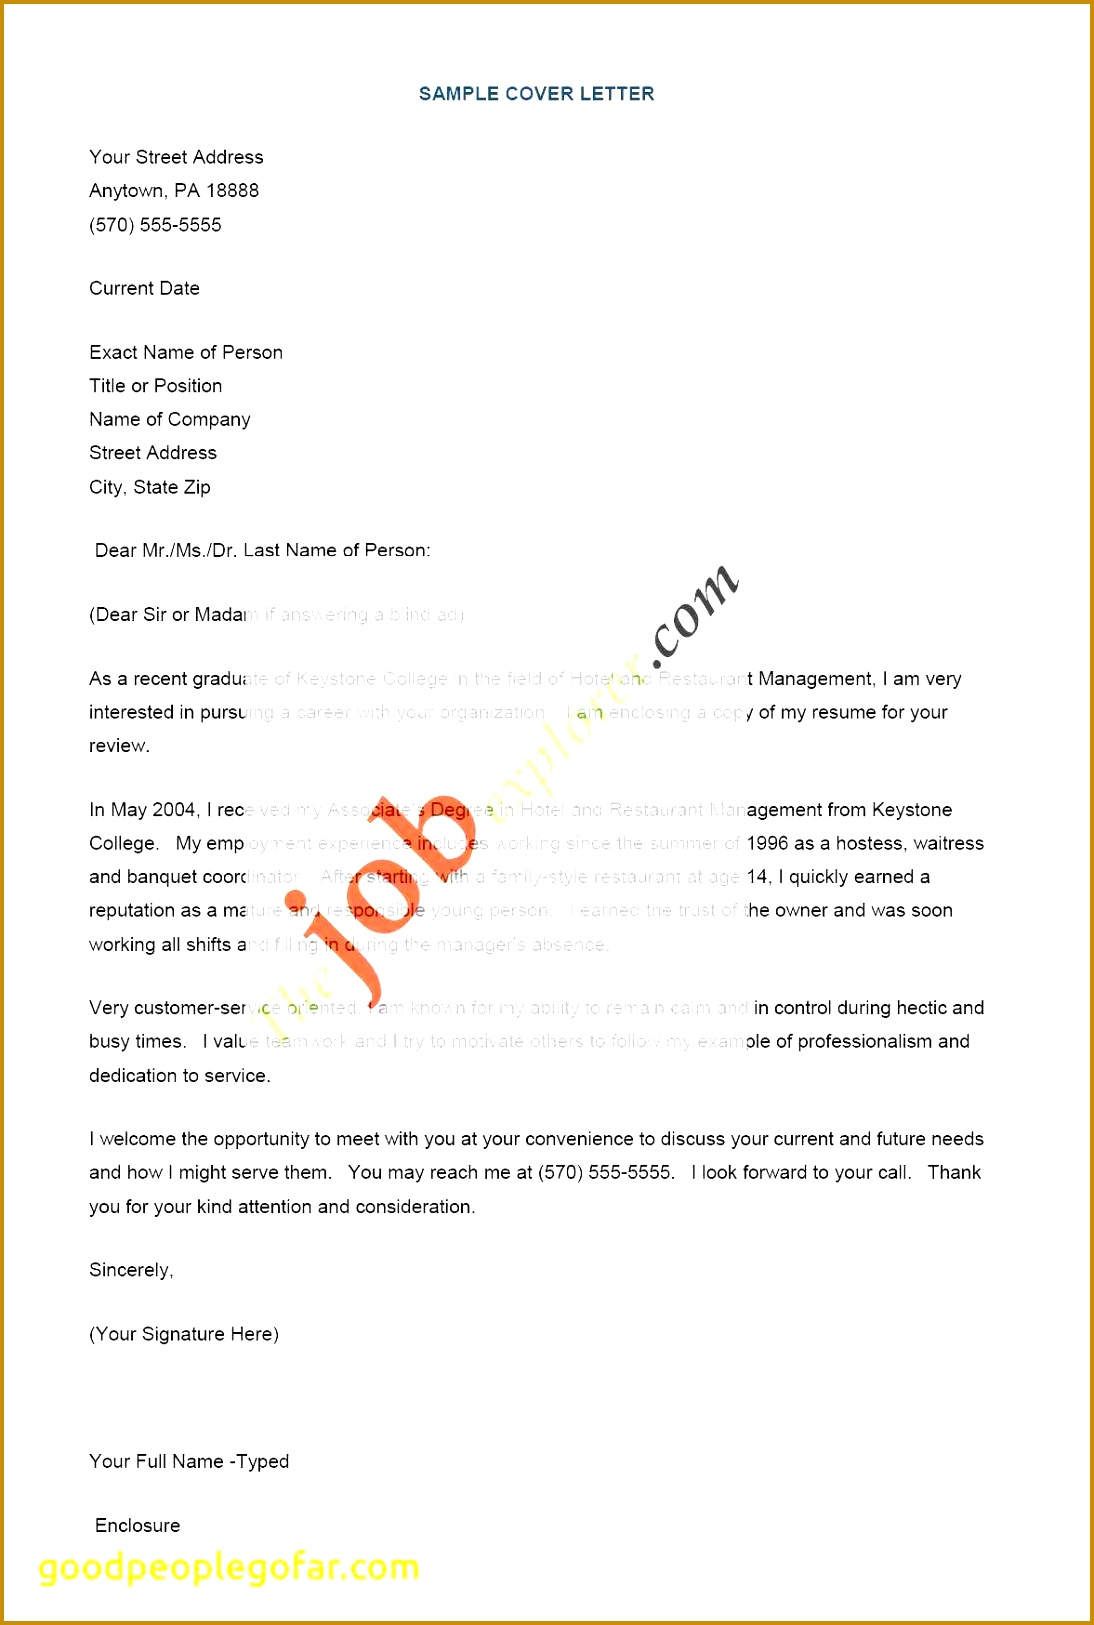 Best Resume Inspirational Best Cover Letter Lovely formatted Resume 0d Professional Resume 16251094